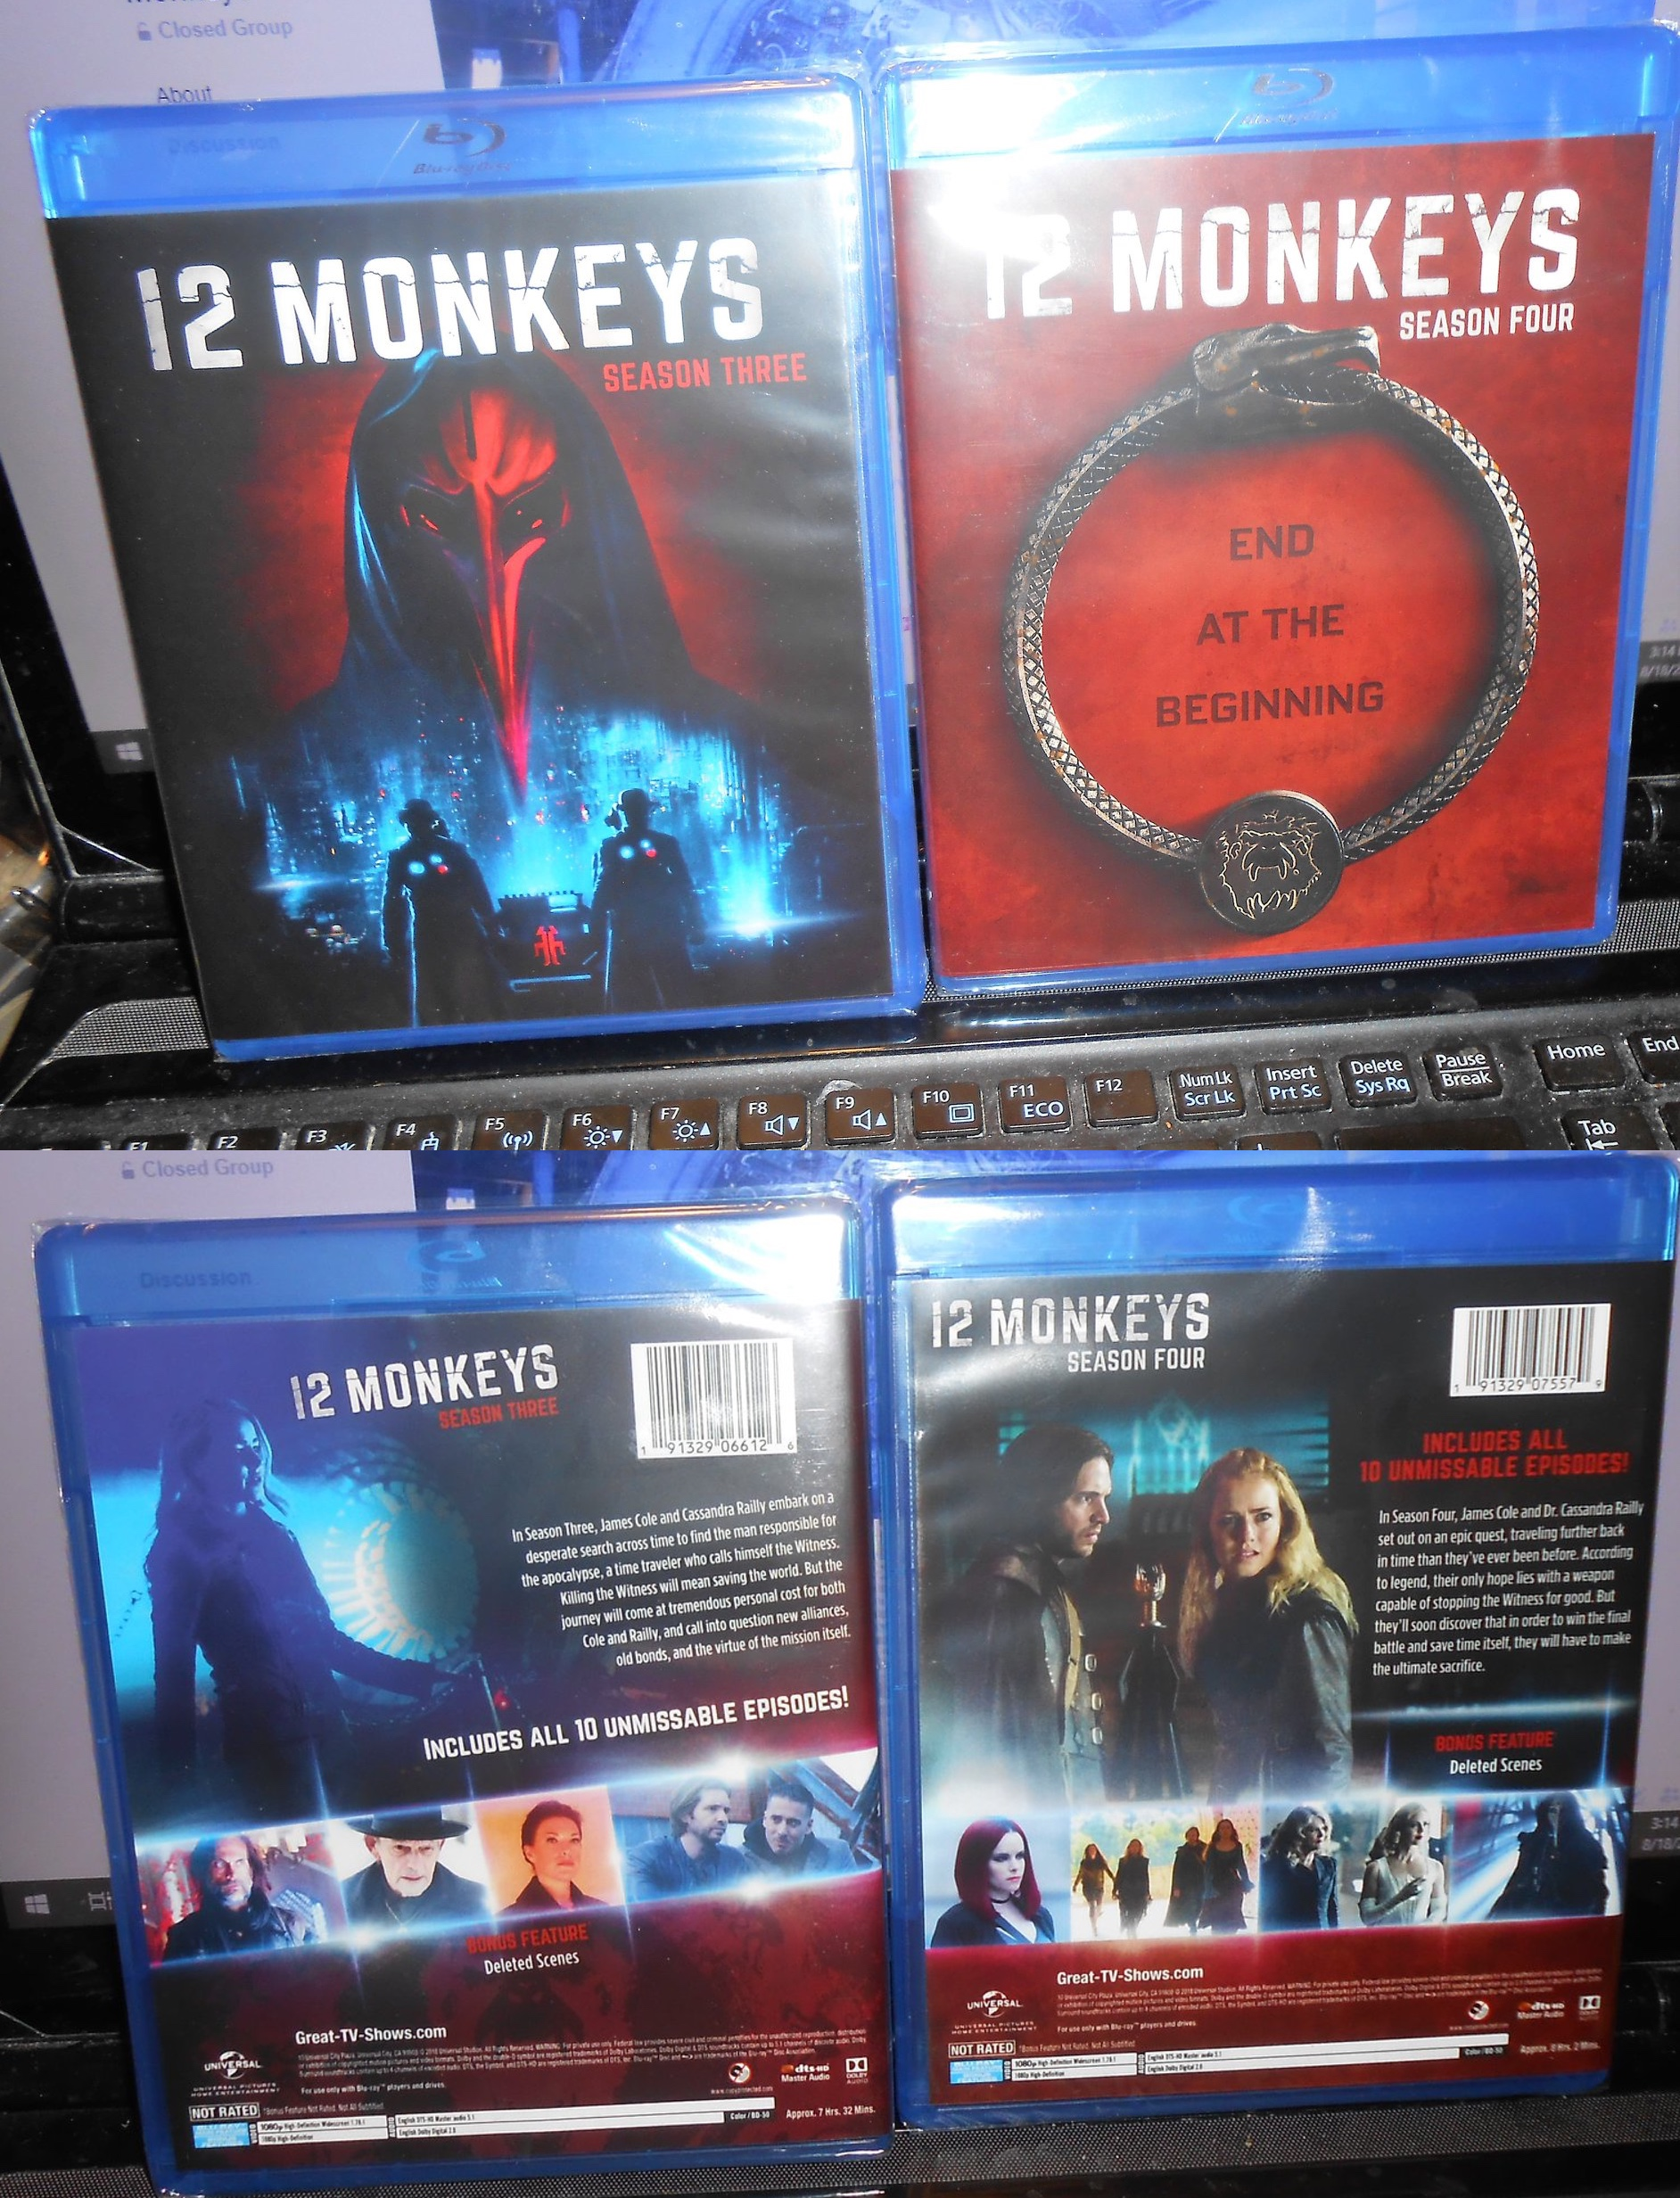 12 monkeys season 2 free download